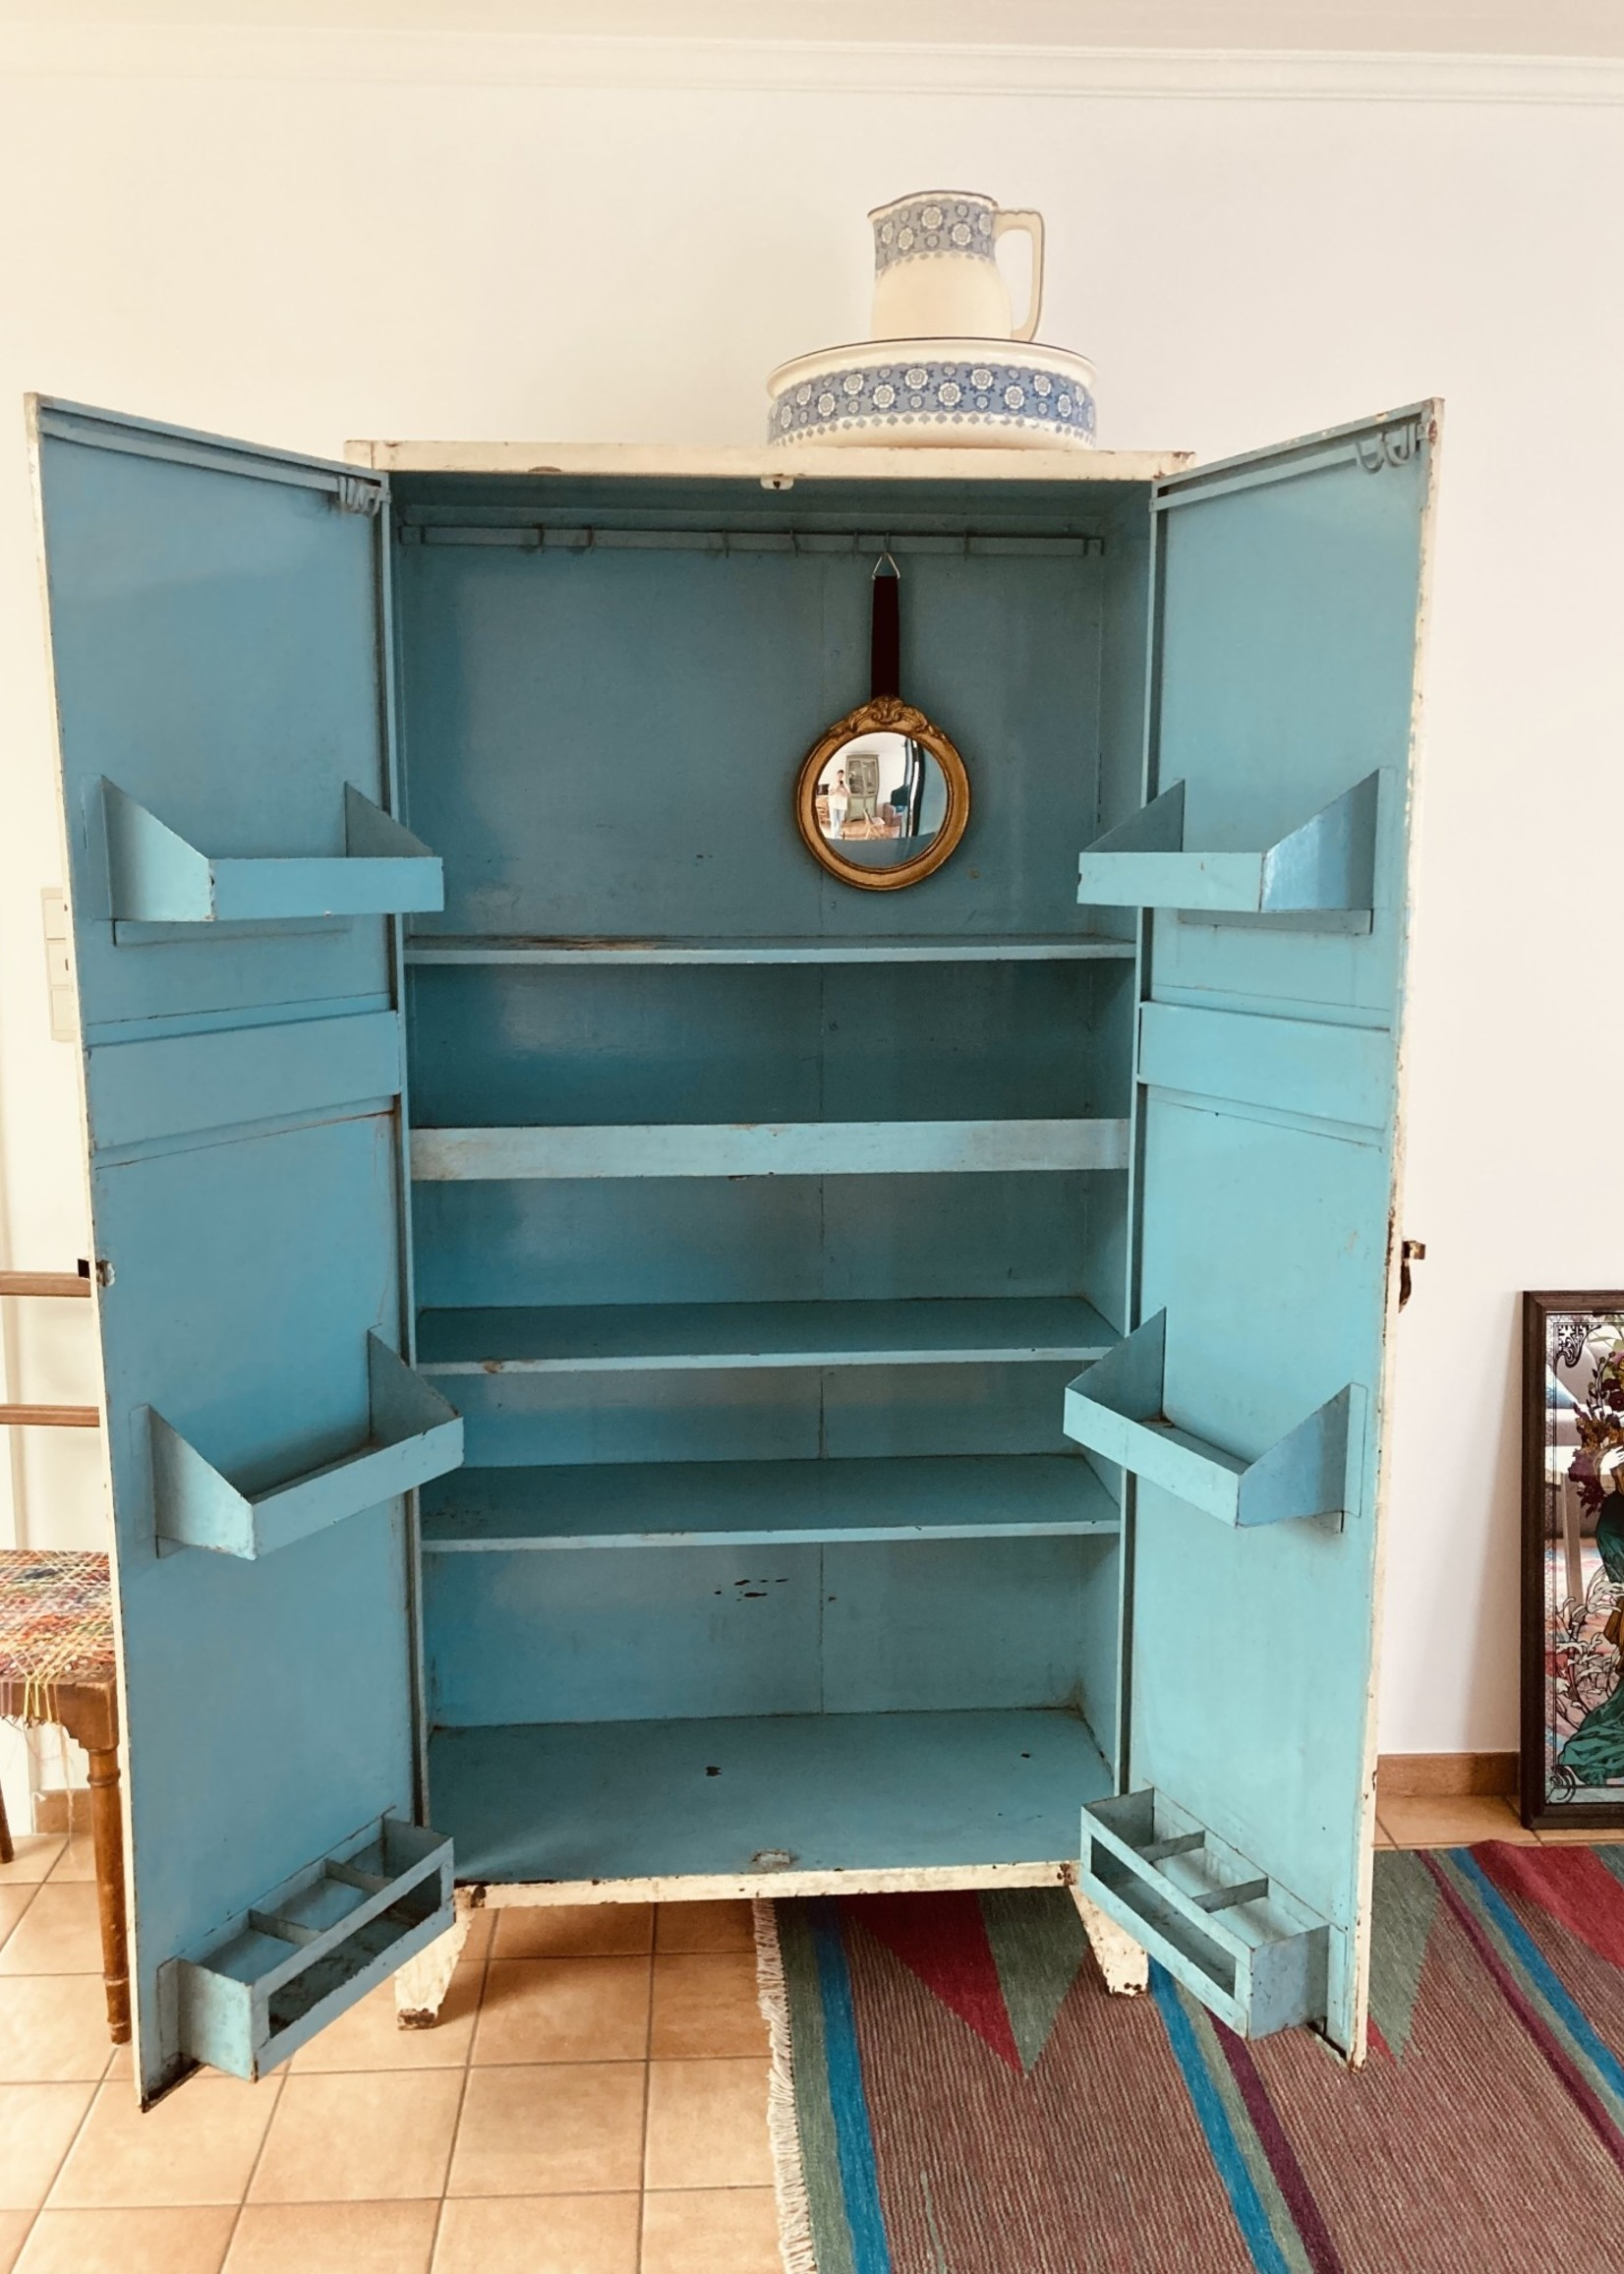 Antique metal food  storage